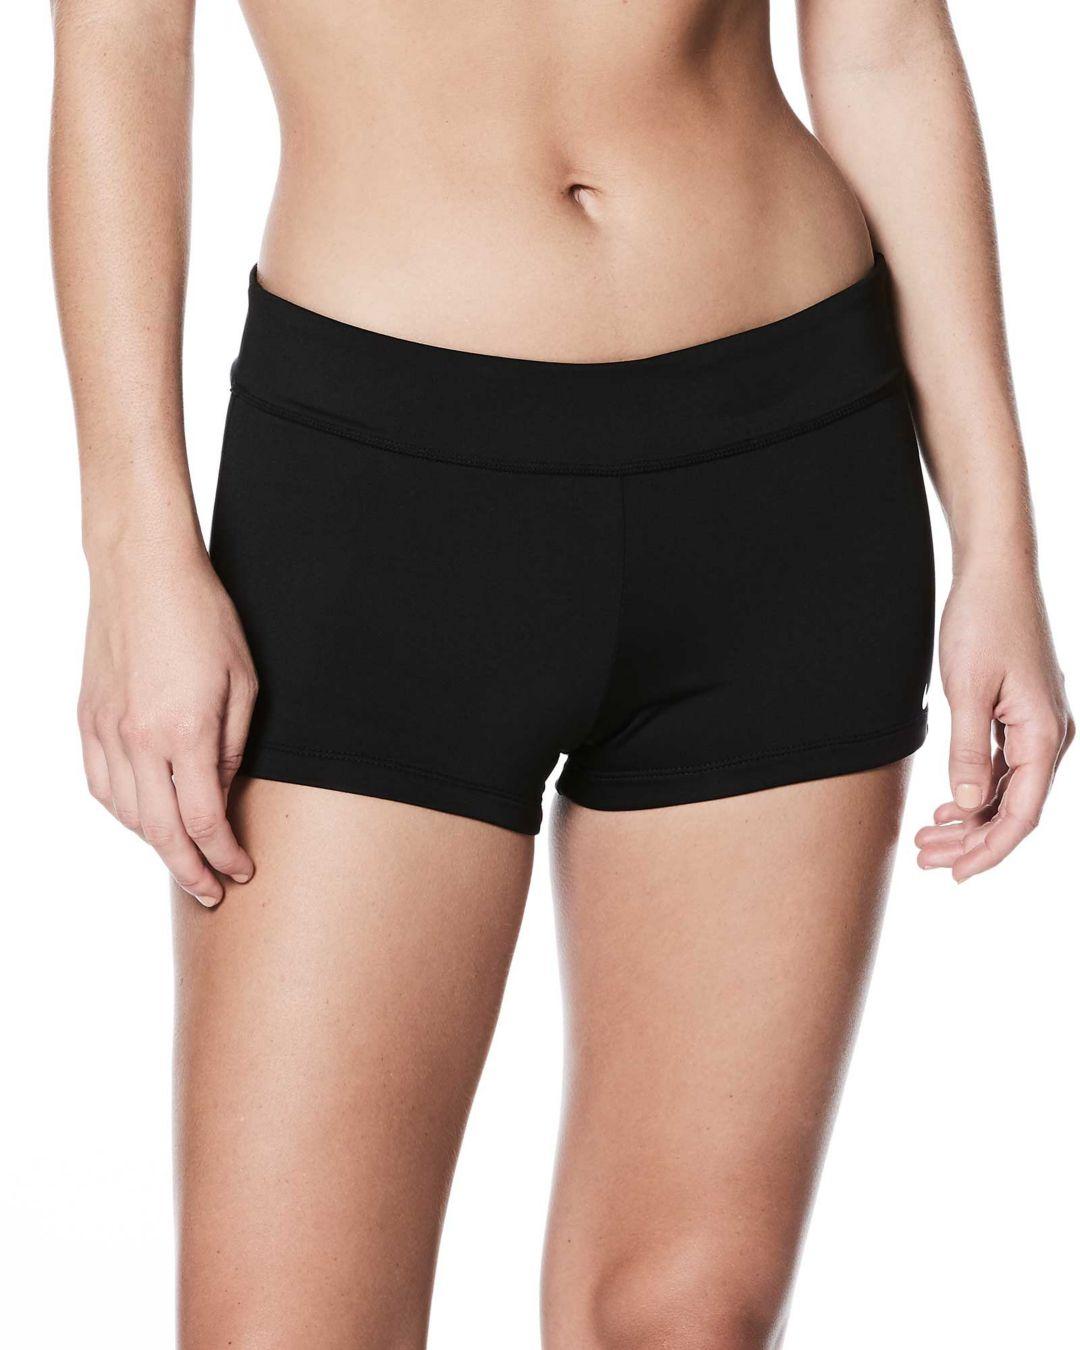 a456a456f3 Nike Women's Kick Short | DICK'S Sporting Goods